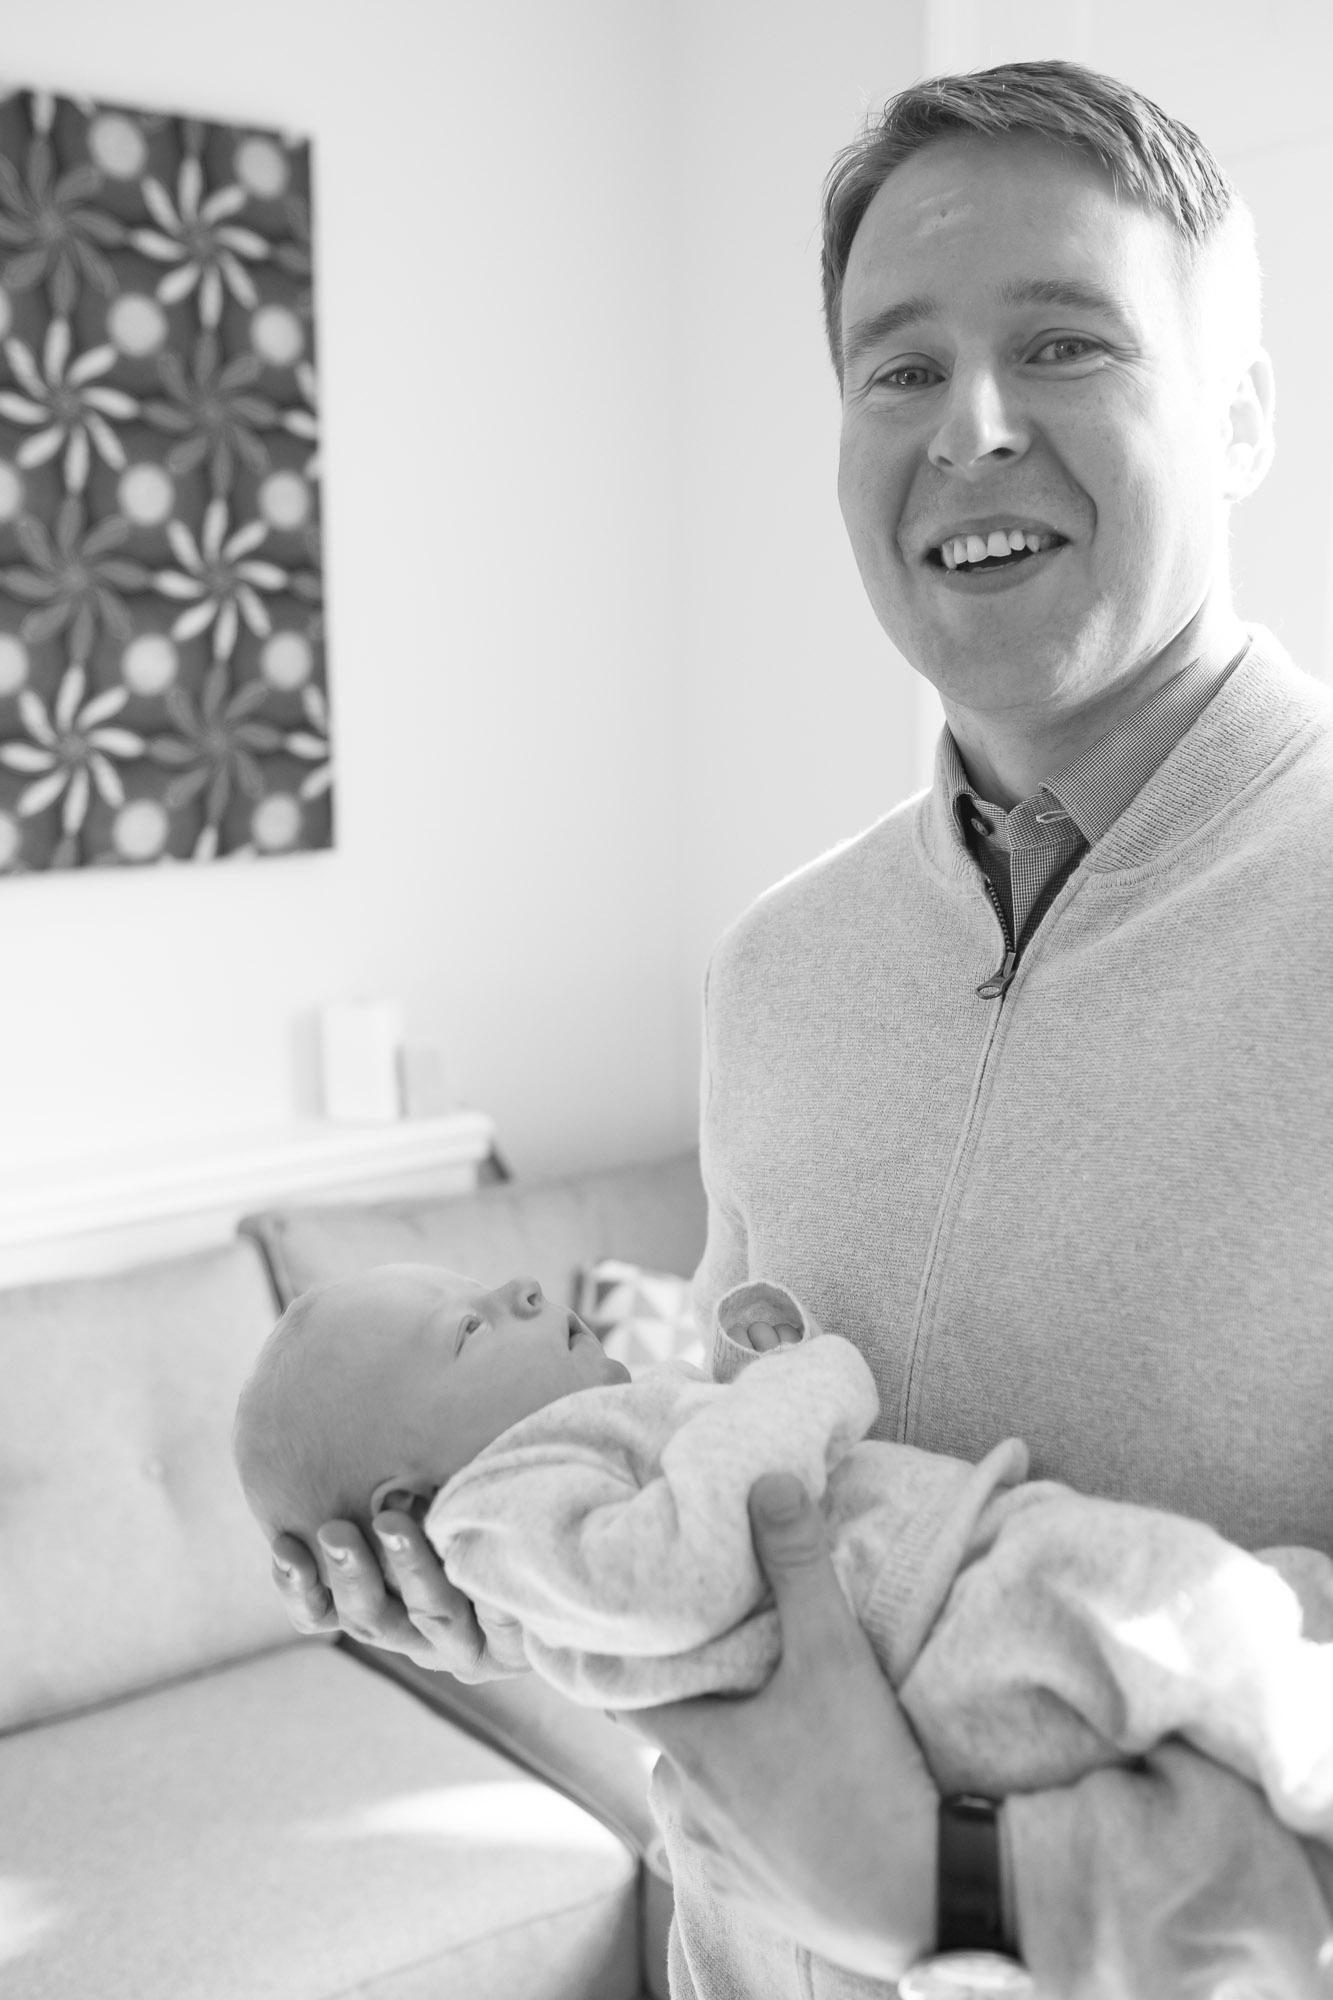 newborn-baby-family-portrait-photographer-073.jpg